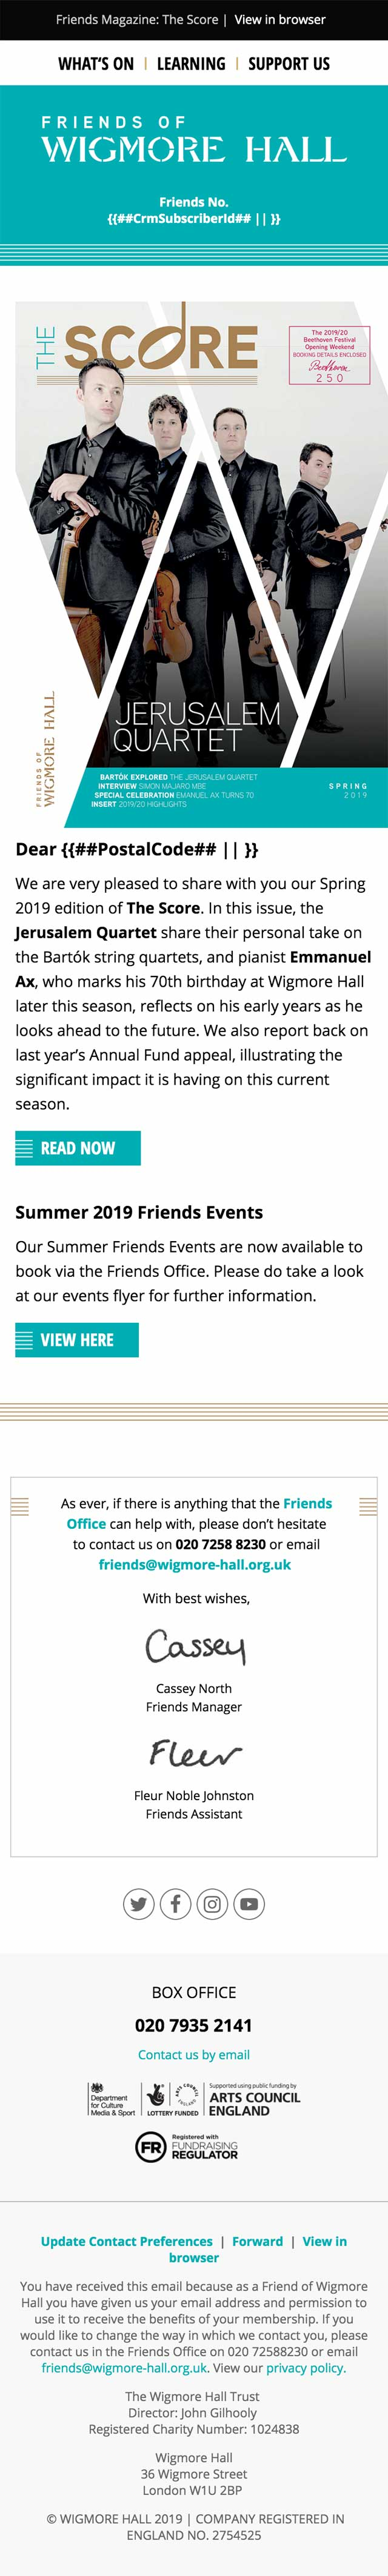 Friends Magazine: The Score - Spring 2019 - mobile view